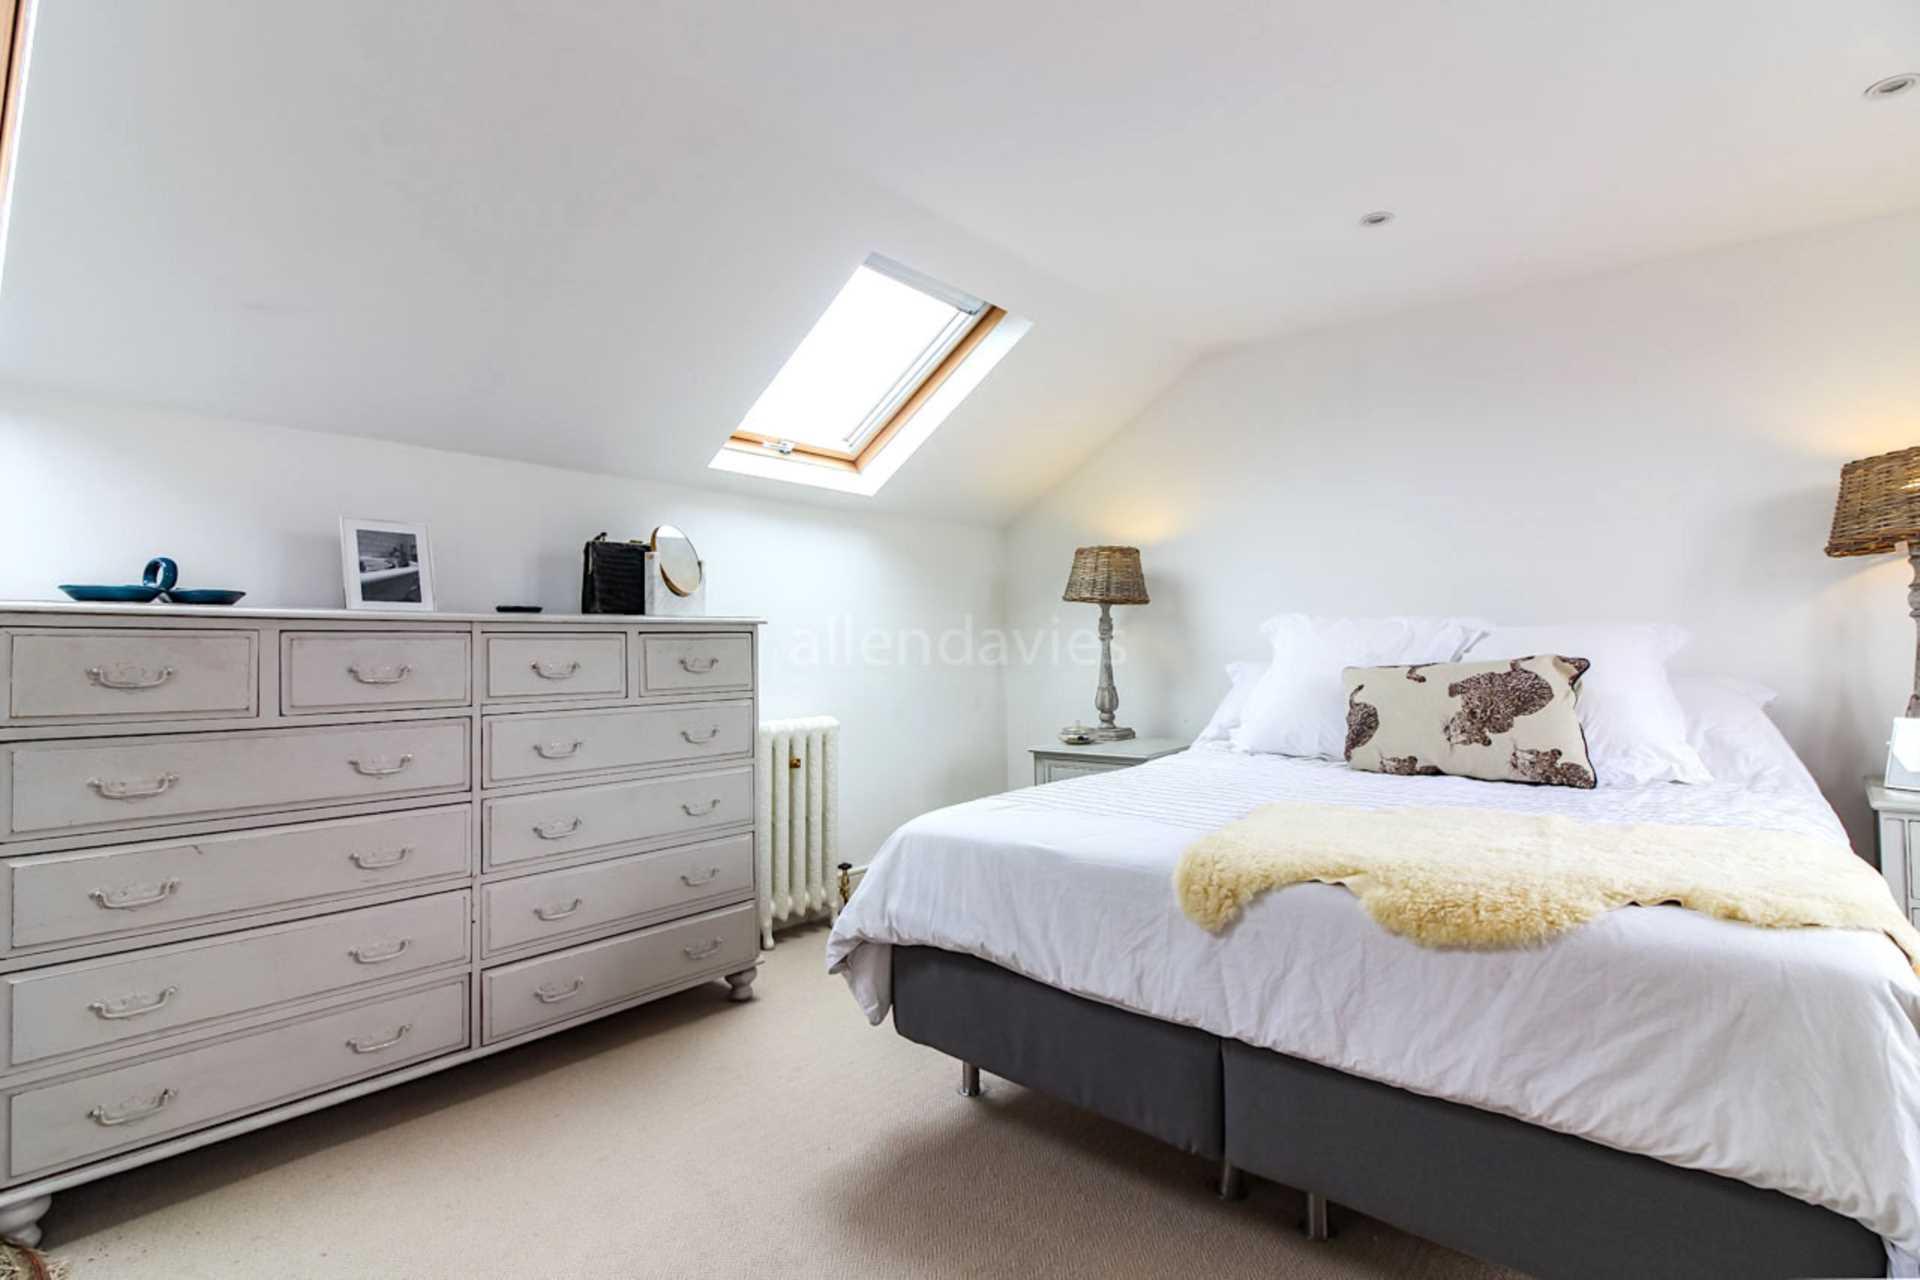 Morley, Leyton, Image 19